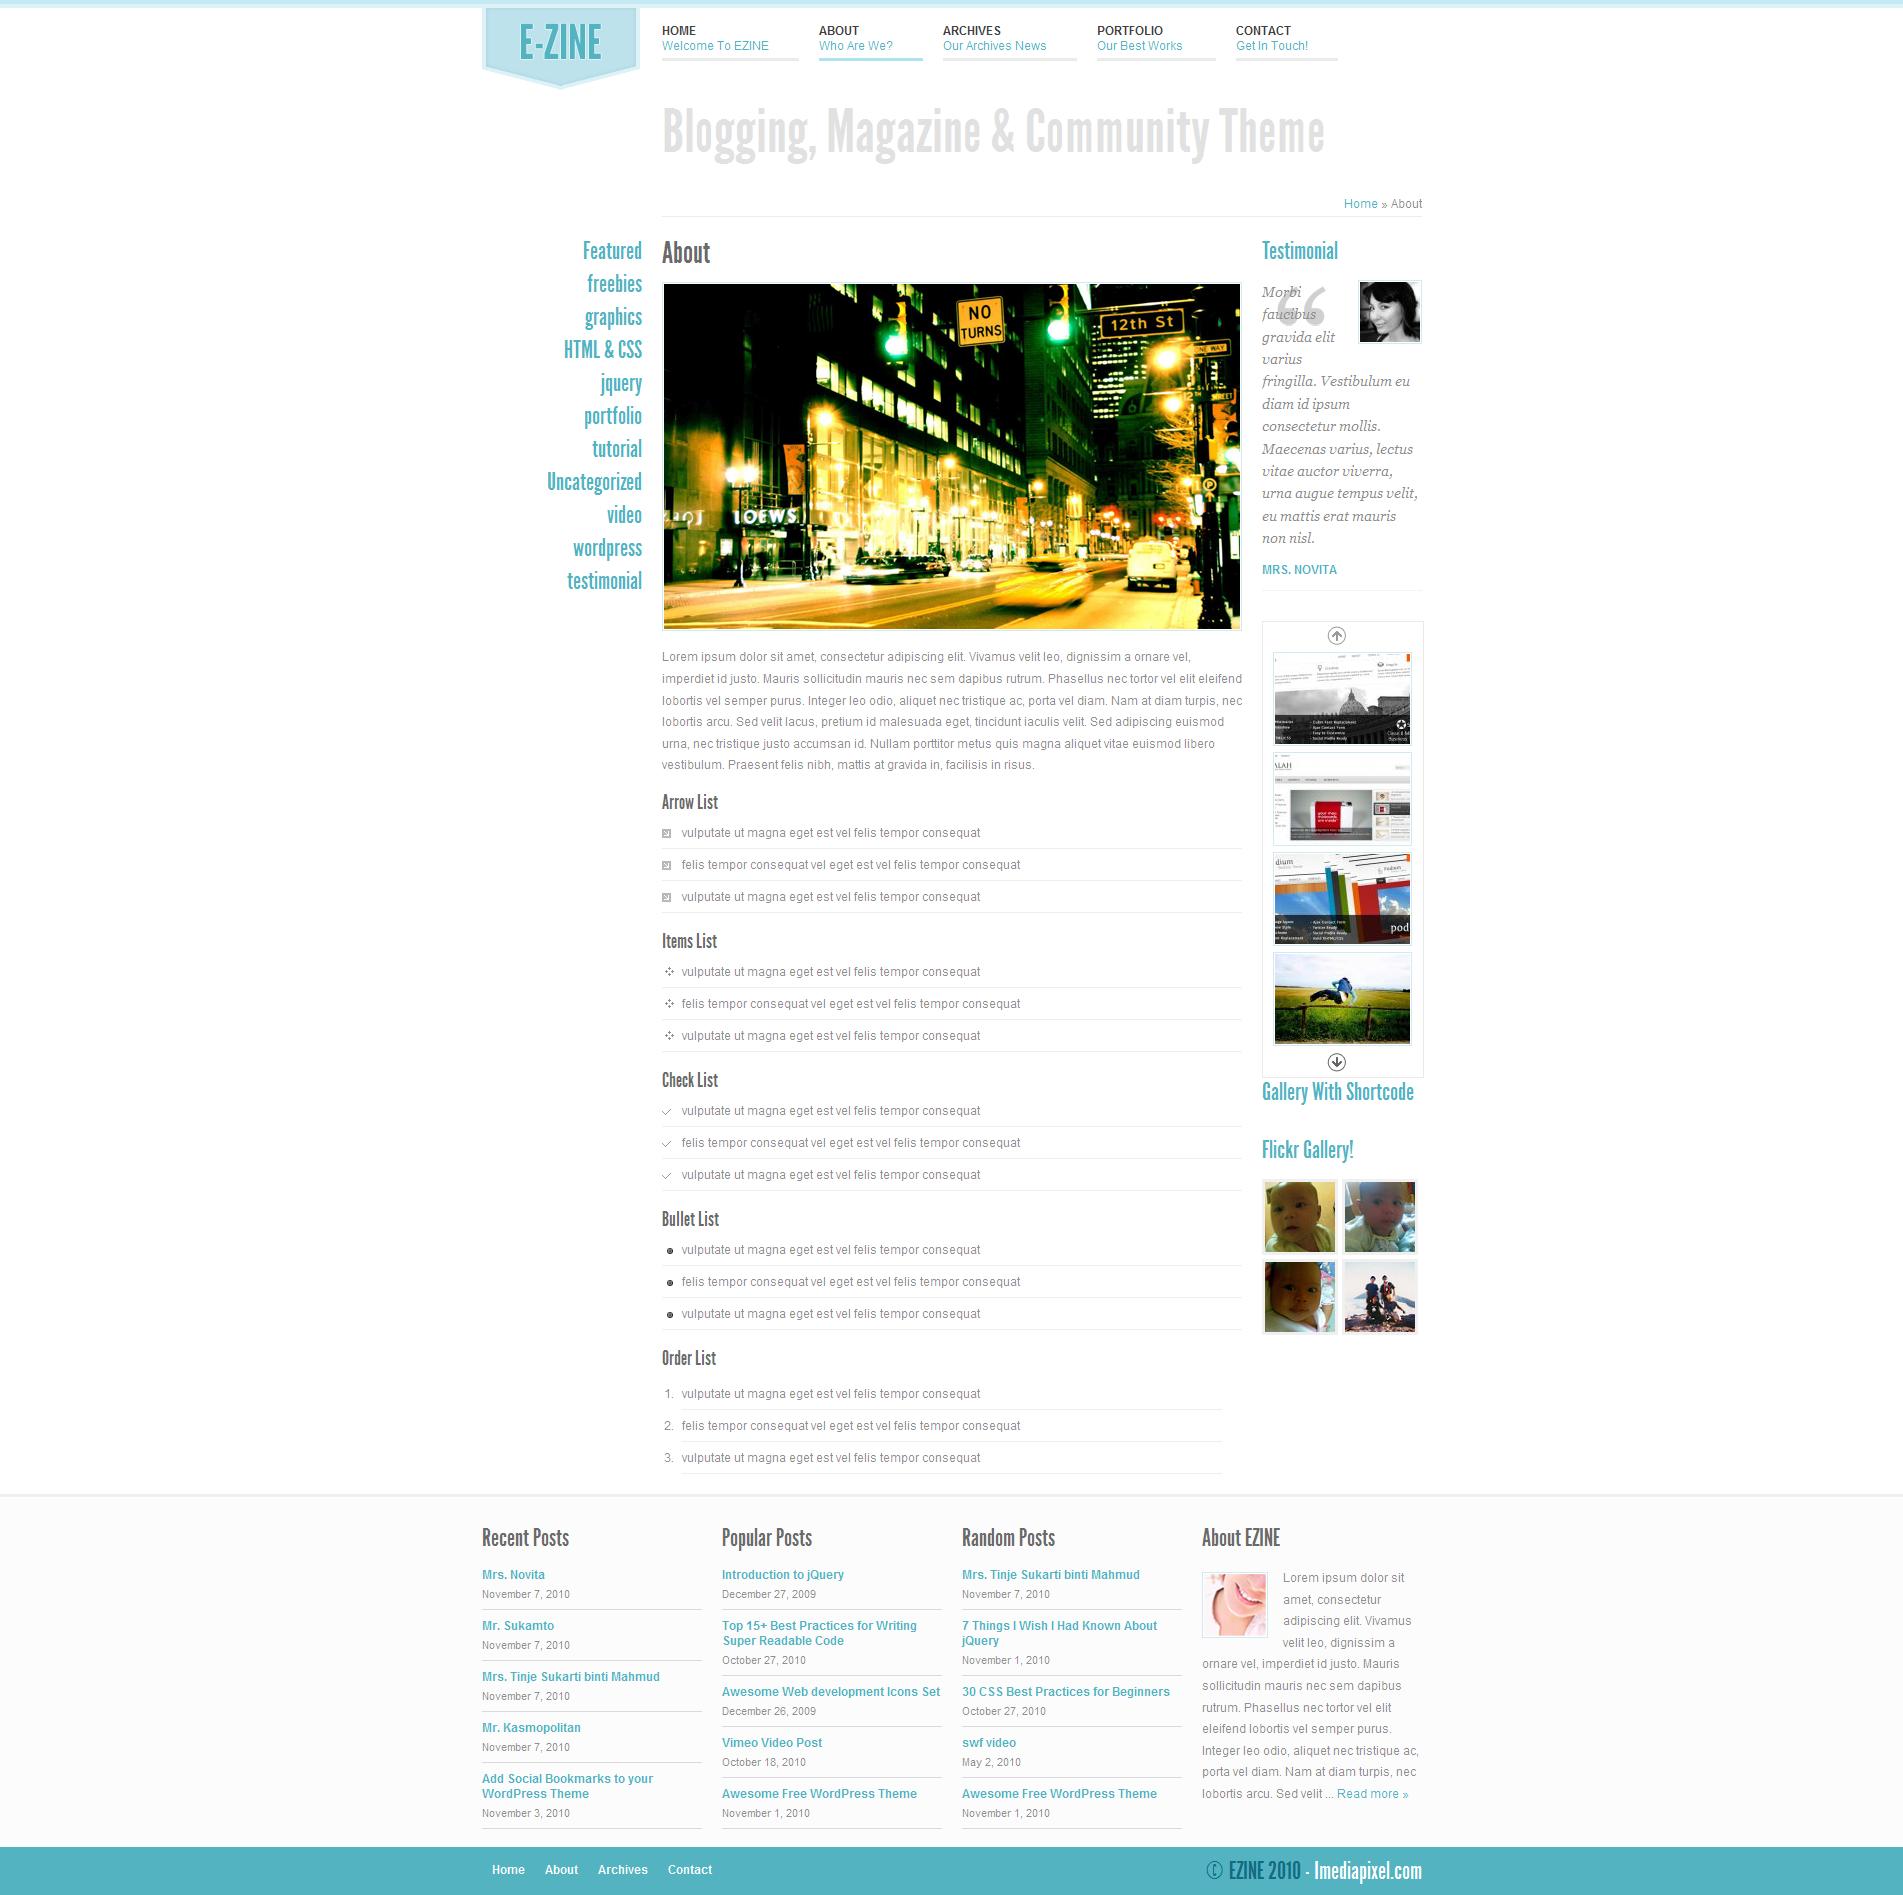 EZINE - 4 in 1 Wordpress Theme